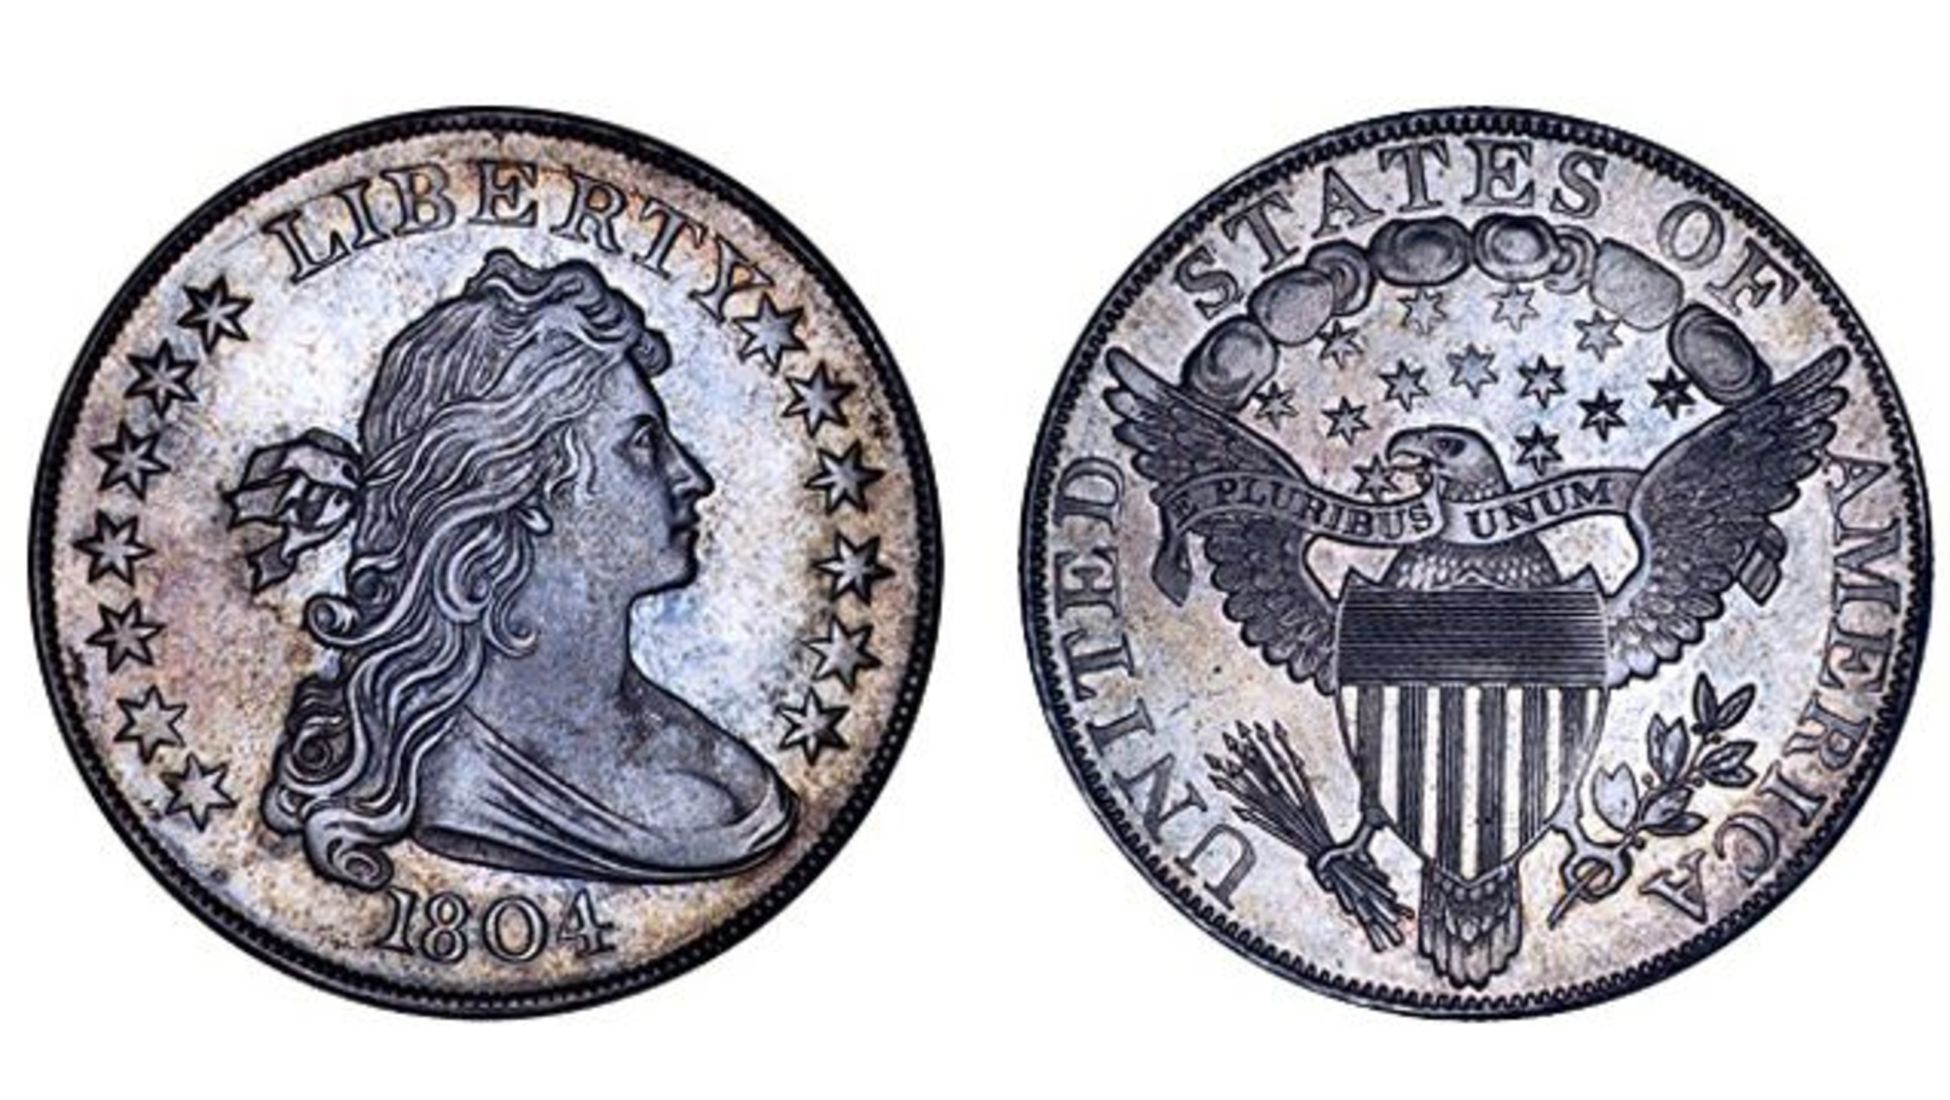 1 Dollar 1804 Bust Dollar Class I Mickley Hawn Queller Specimen 3 294 000 In 2020 Valuable Coins Coins Silver Bullion